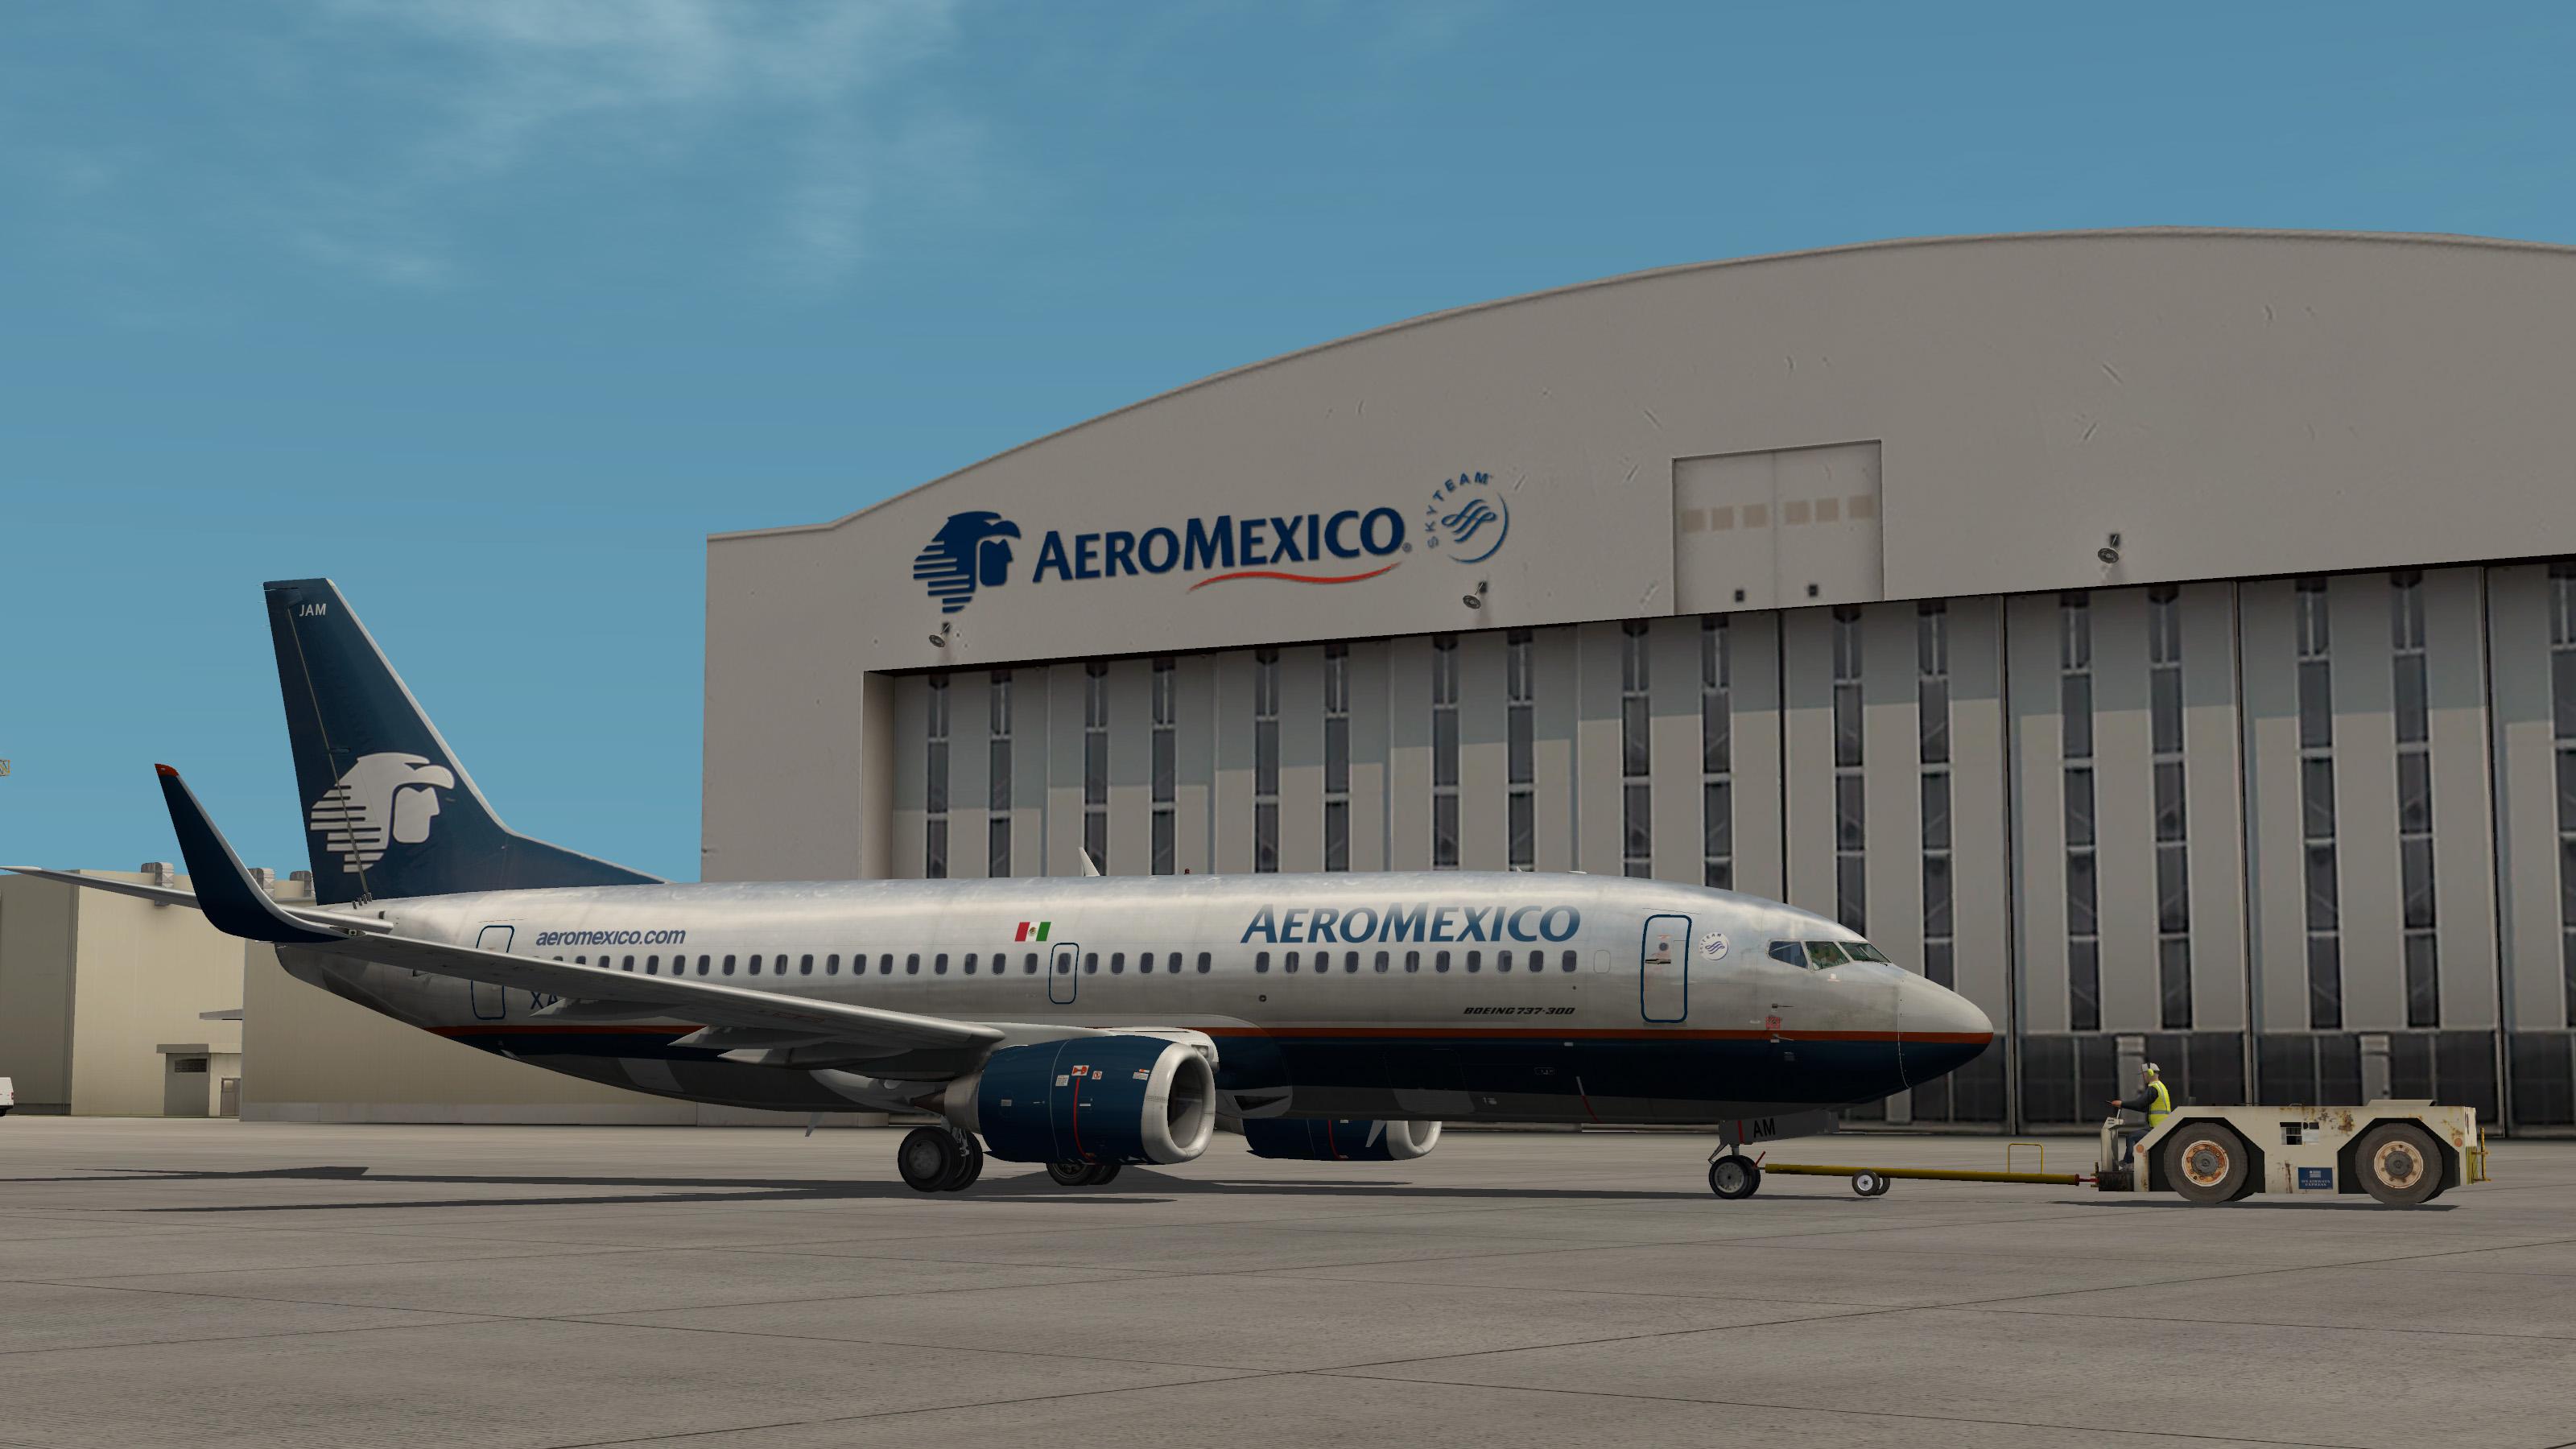 AeroMexico Classic IXEG 737-300 - Aircraft Skins - Liveries